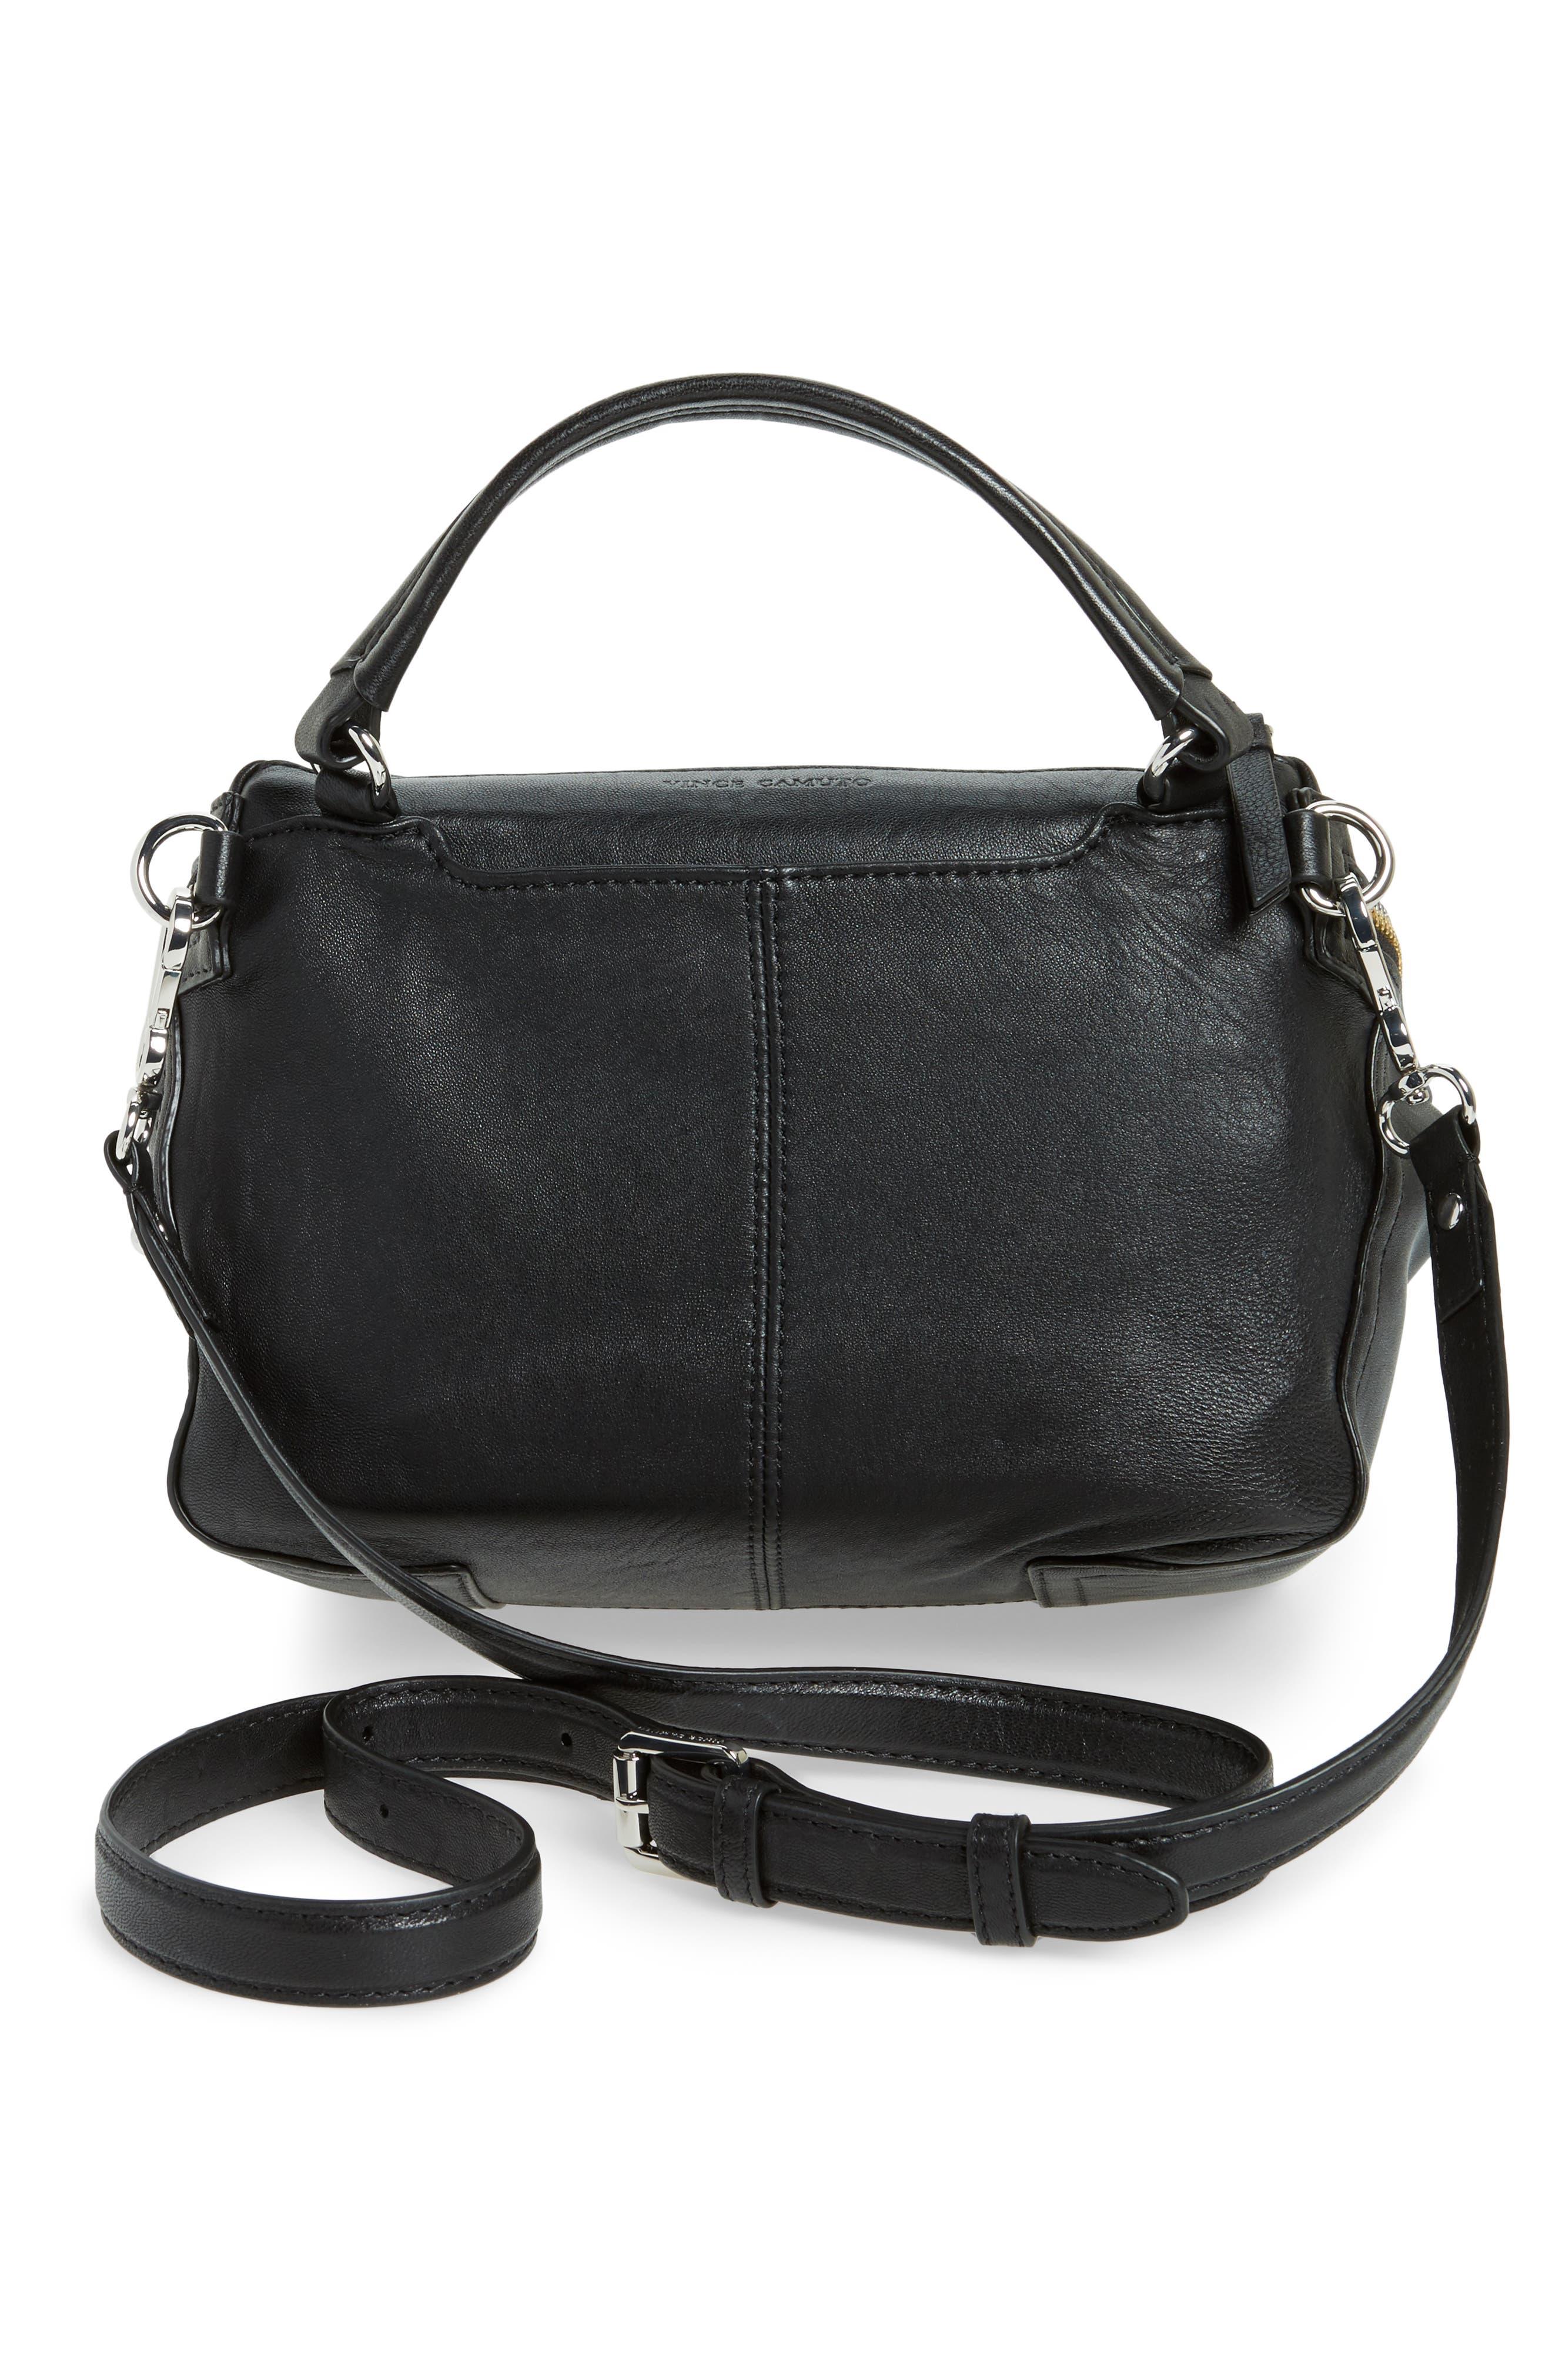 Medium Patch Leather Crossbody Bag,                             Alternate thumbnail 5, color,